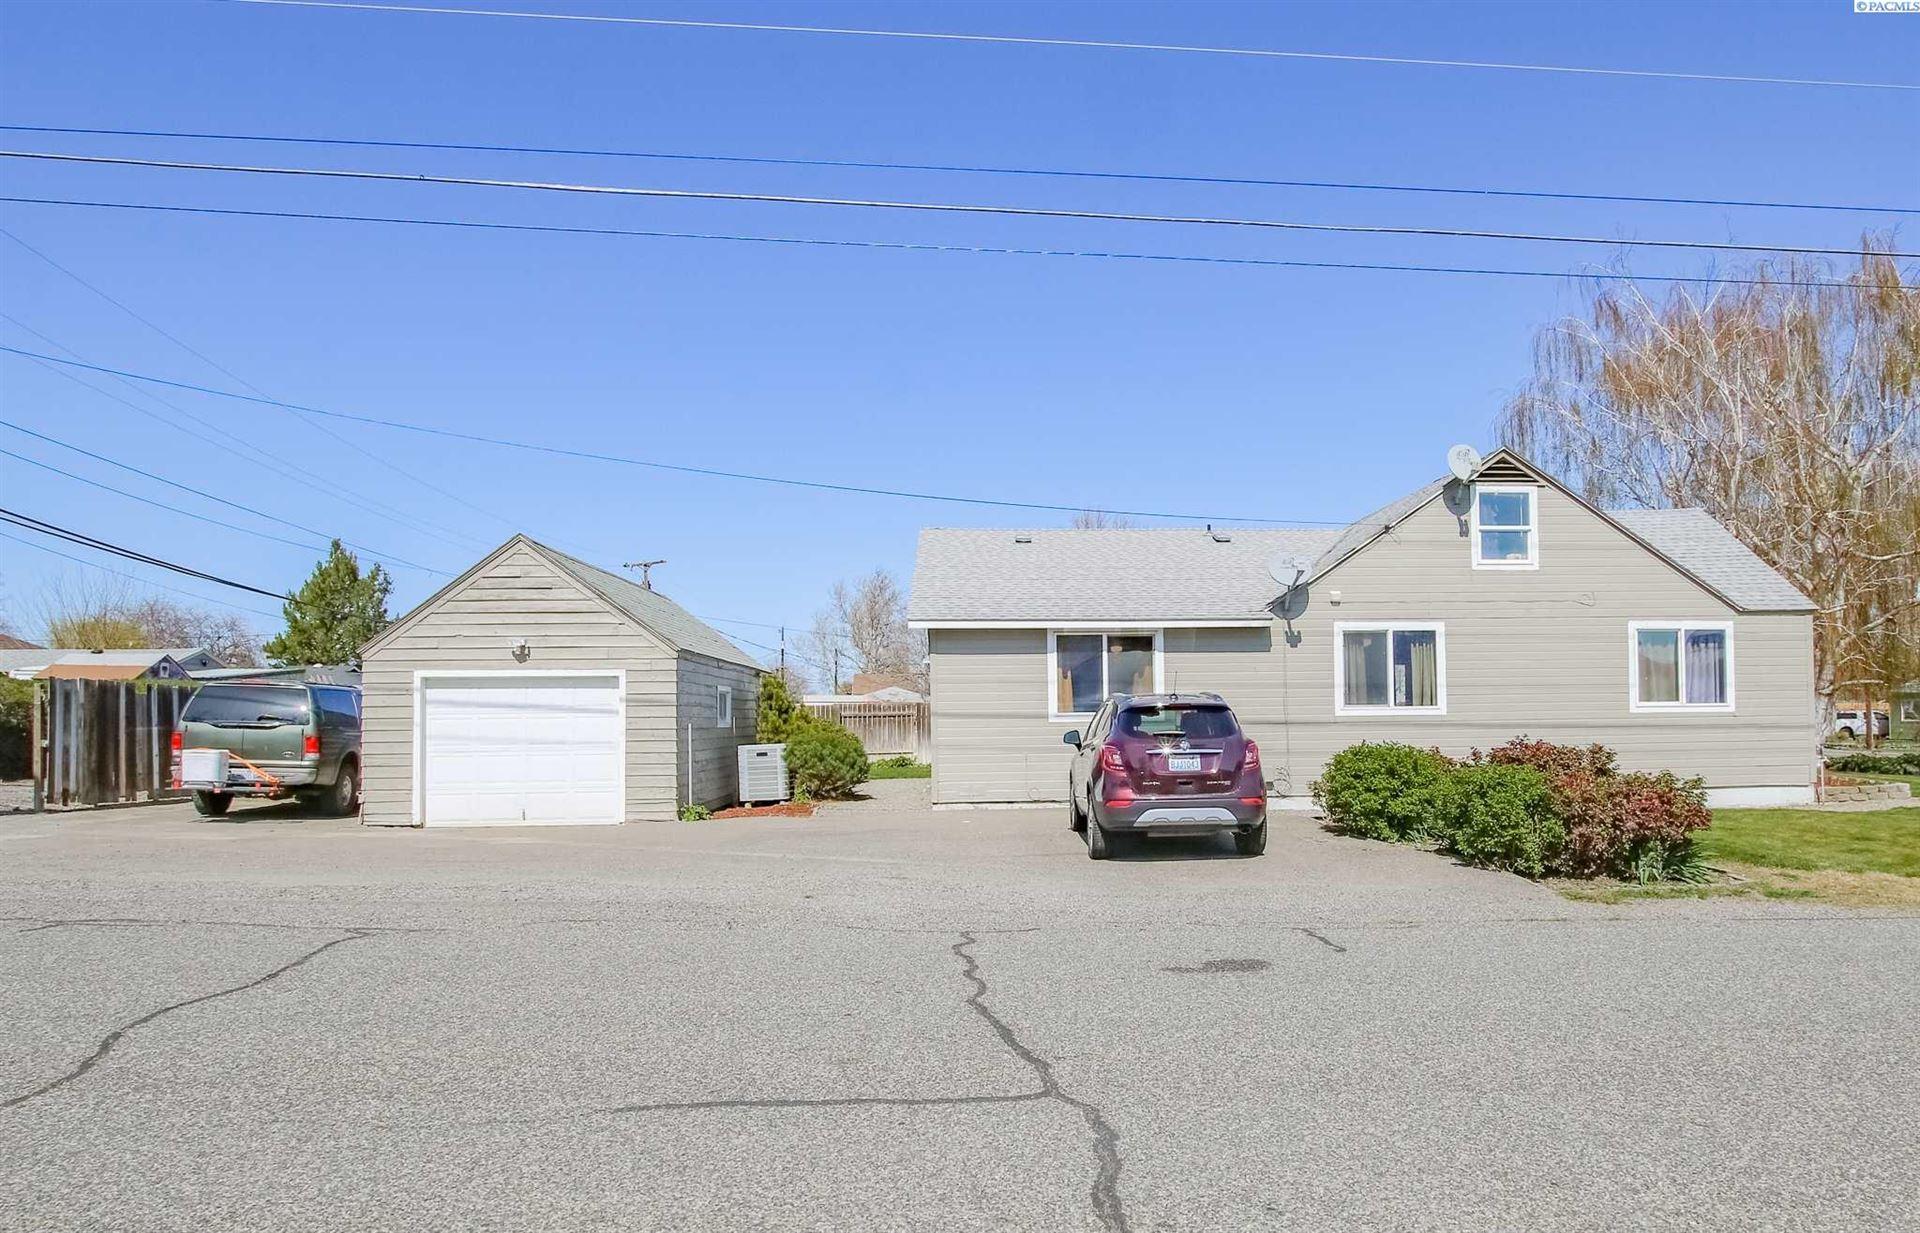 Photo of 801 9th St, Benton City, WA 99320 (MLS # 252866)